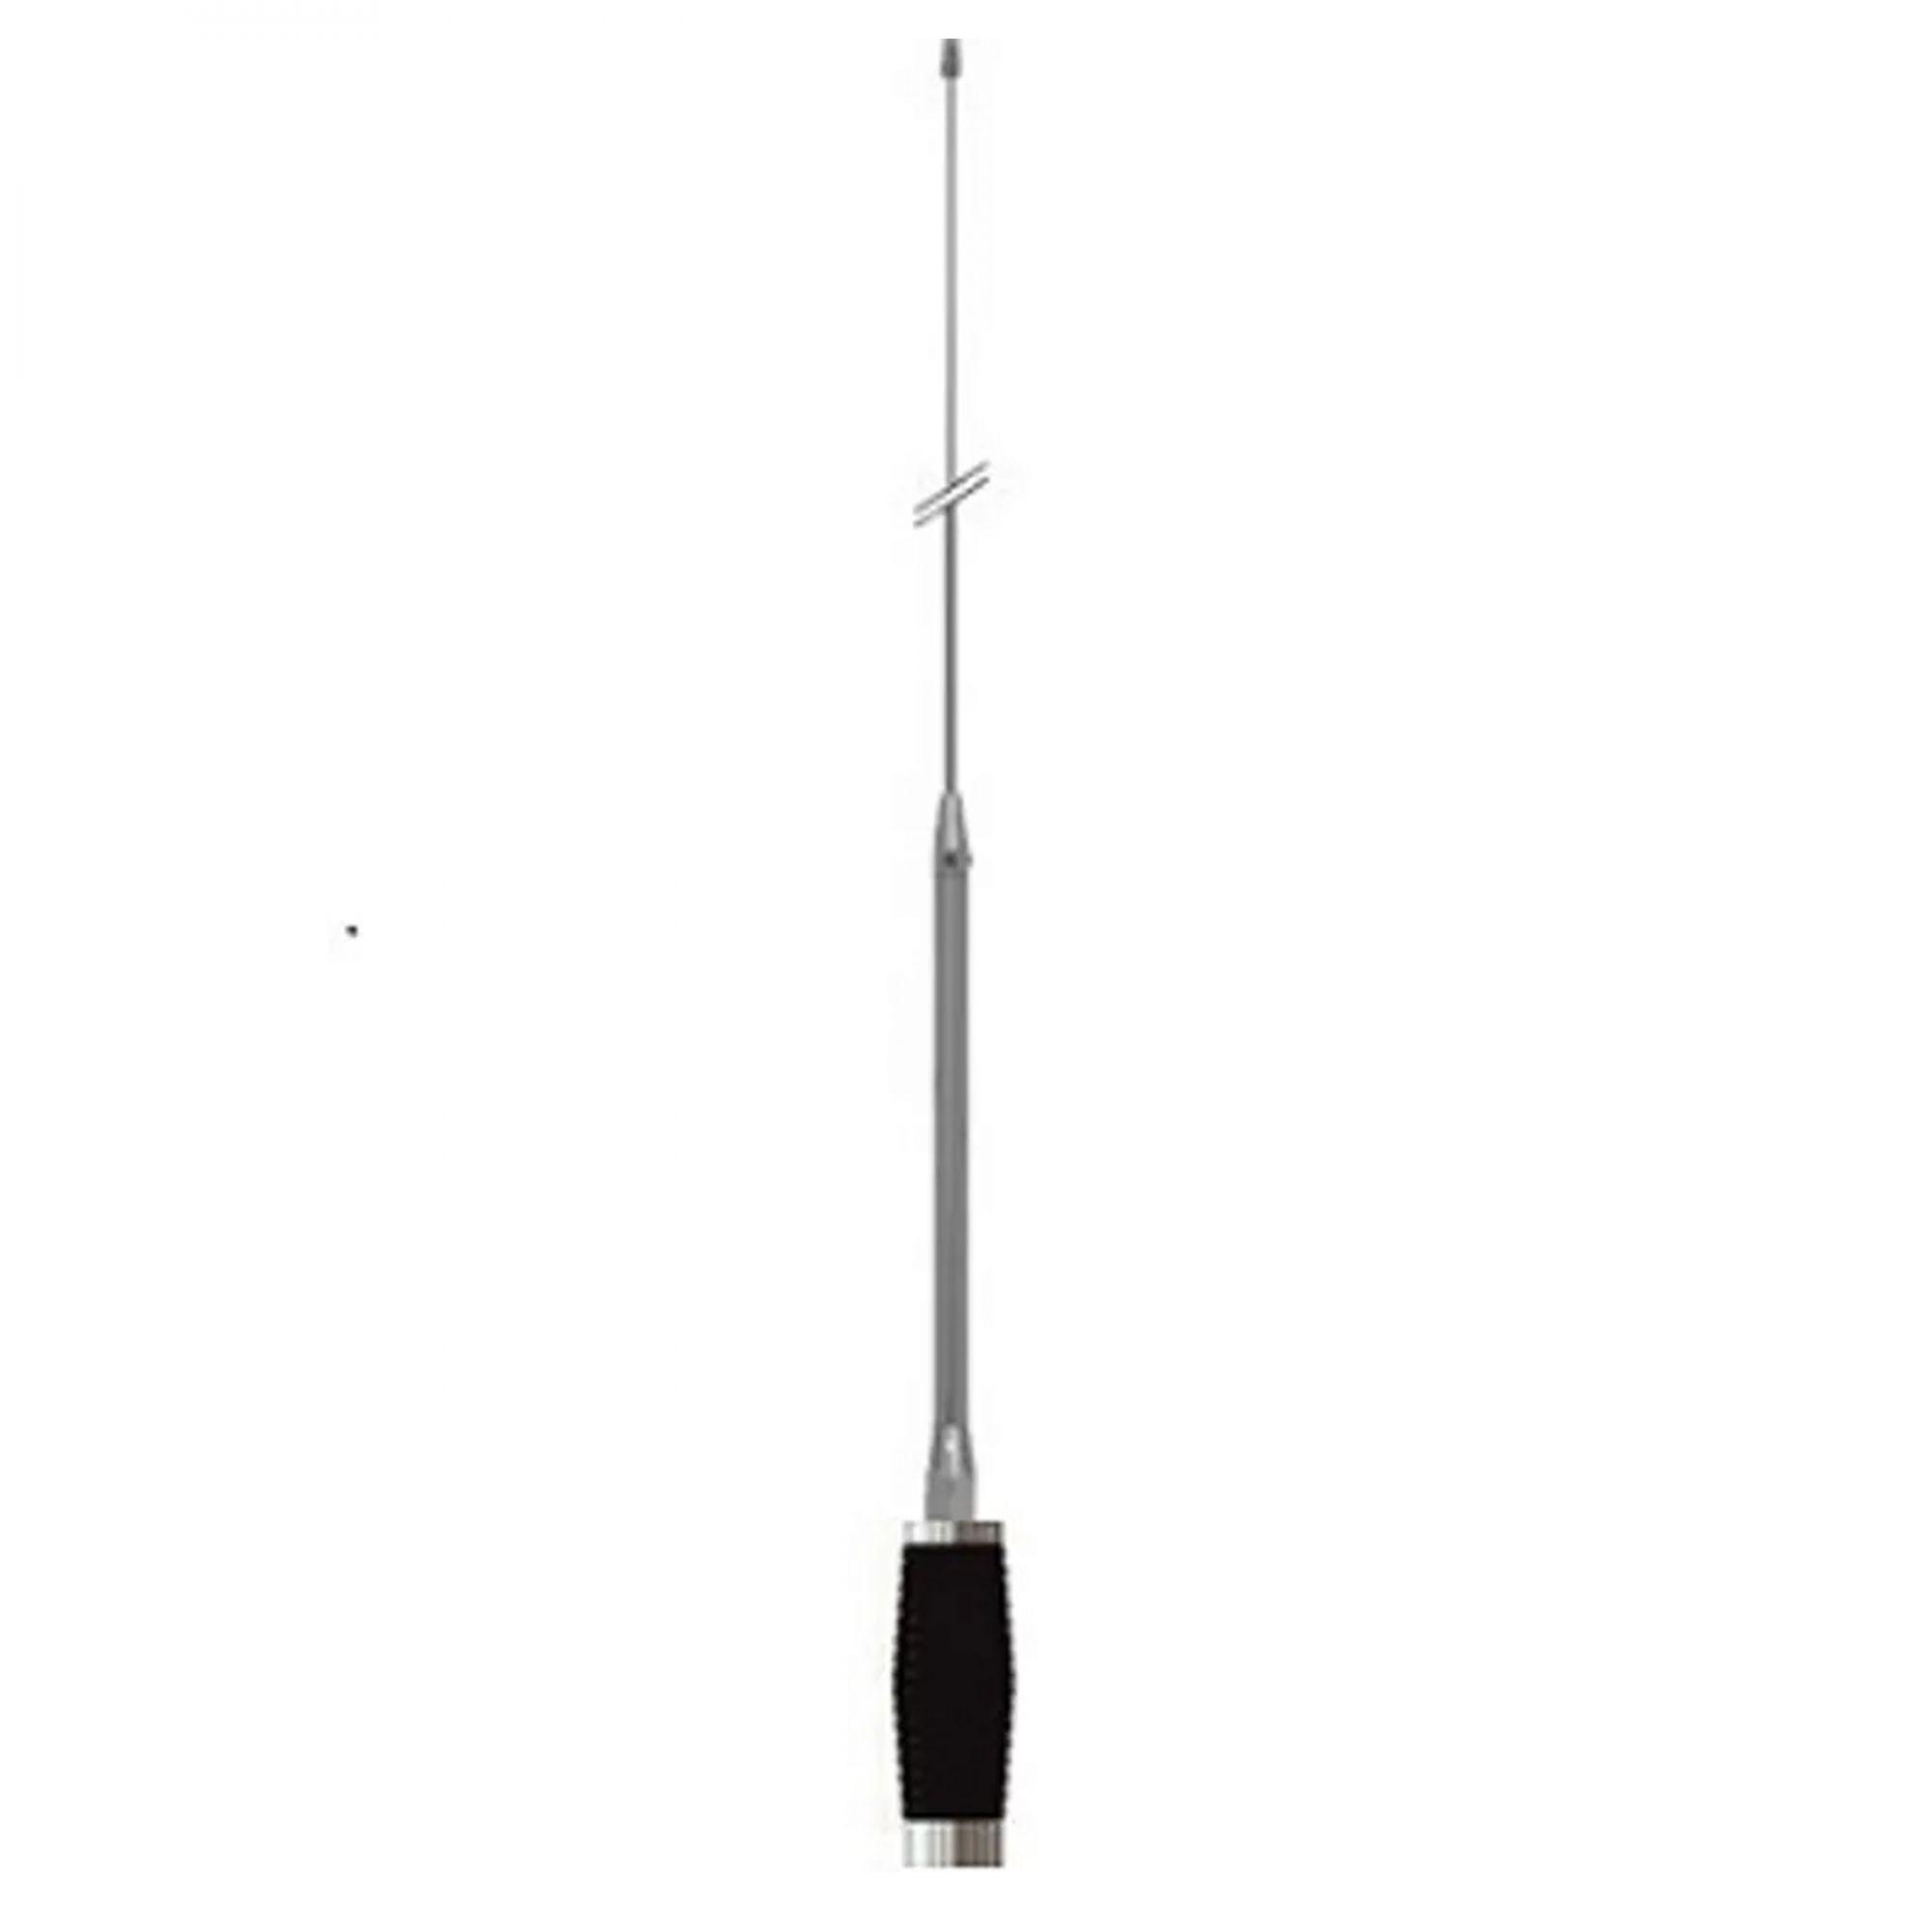 Antena Móvel PX Mini Maria Mole c/ Prolongador Steelbras - AP5100